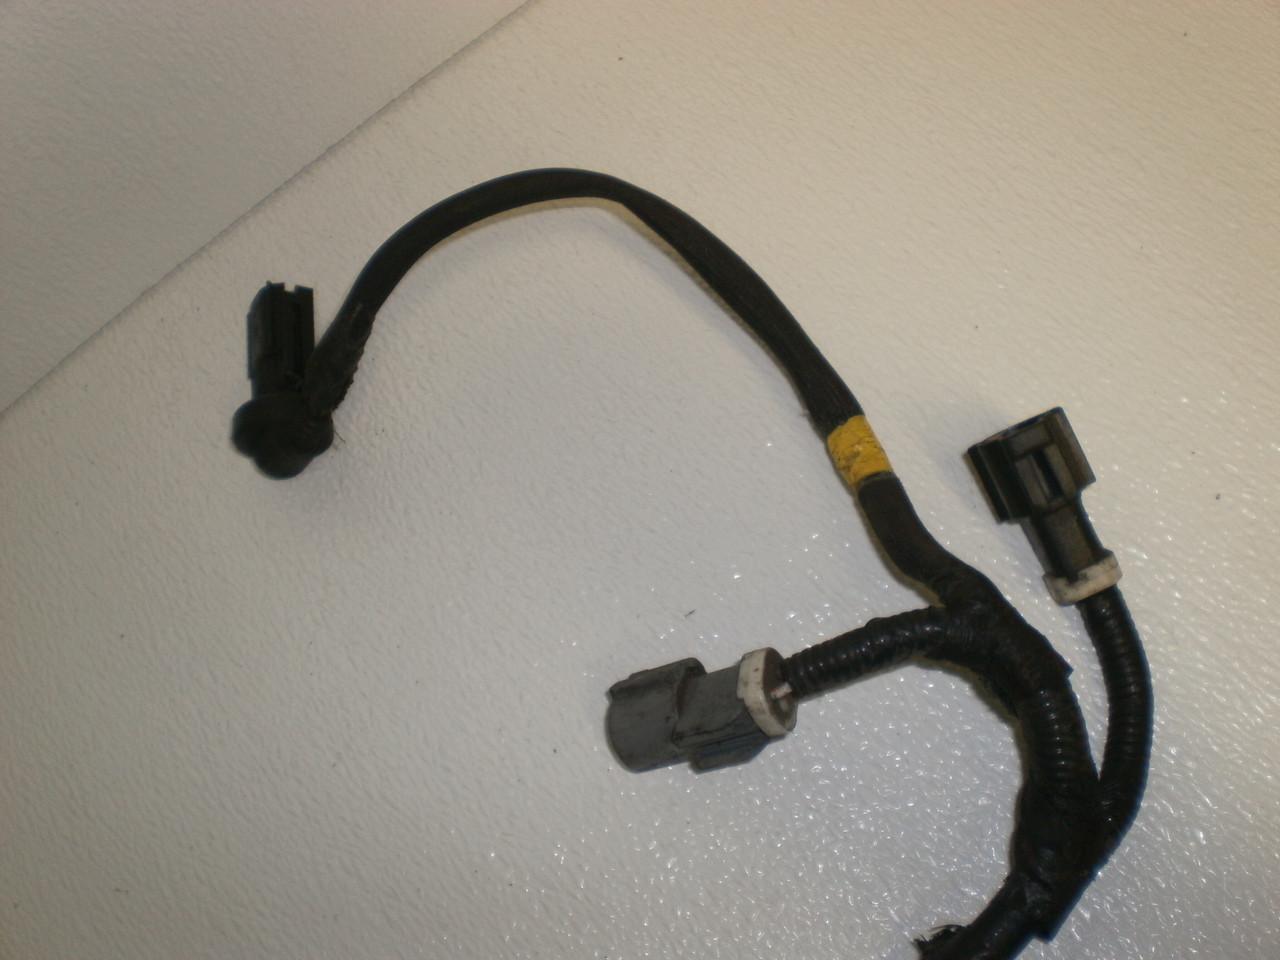 medium resolution of  1996 1998 ford mustang 4 6 crank timing sprocket v8 on pet harness safety harness